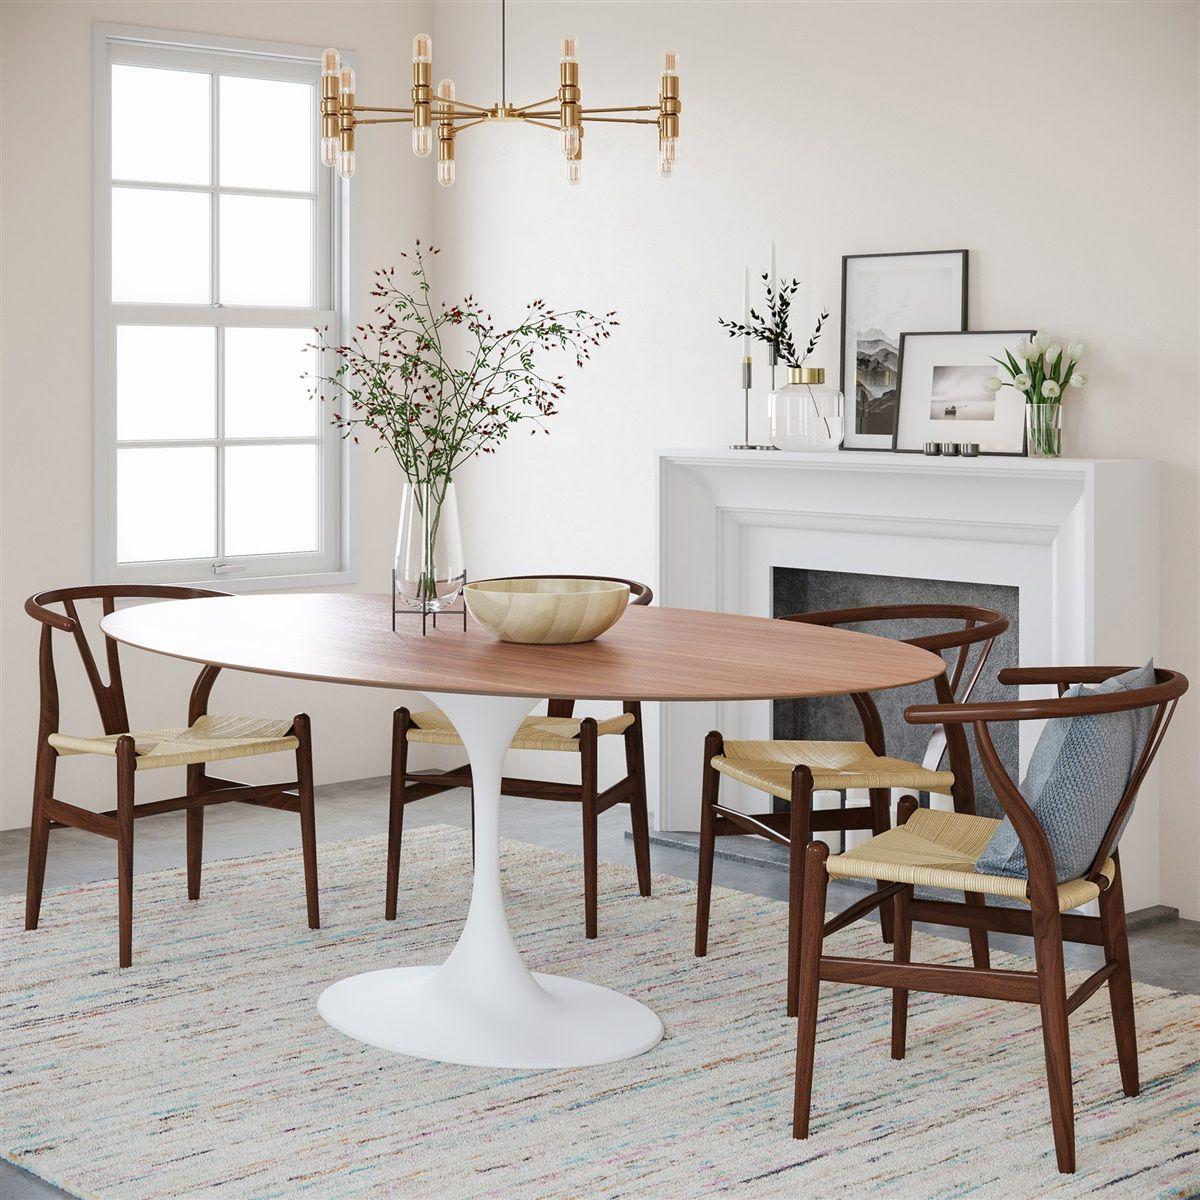 Saarinen Tulip Oval Dining Table Oval Table Dining Saarinen Oval Dining Table Dining Table In Kitchen